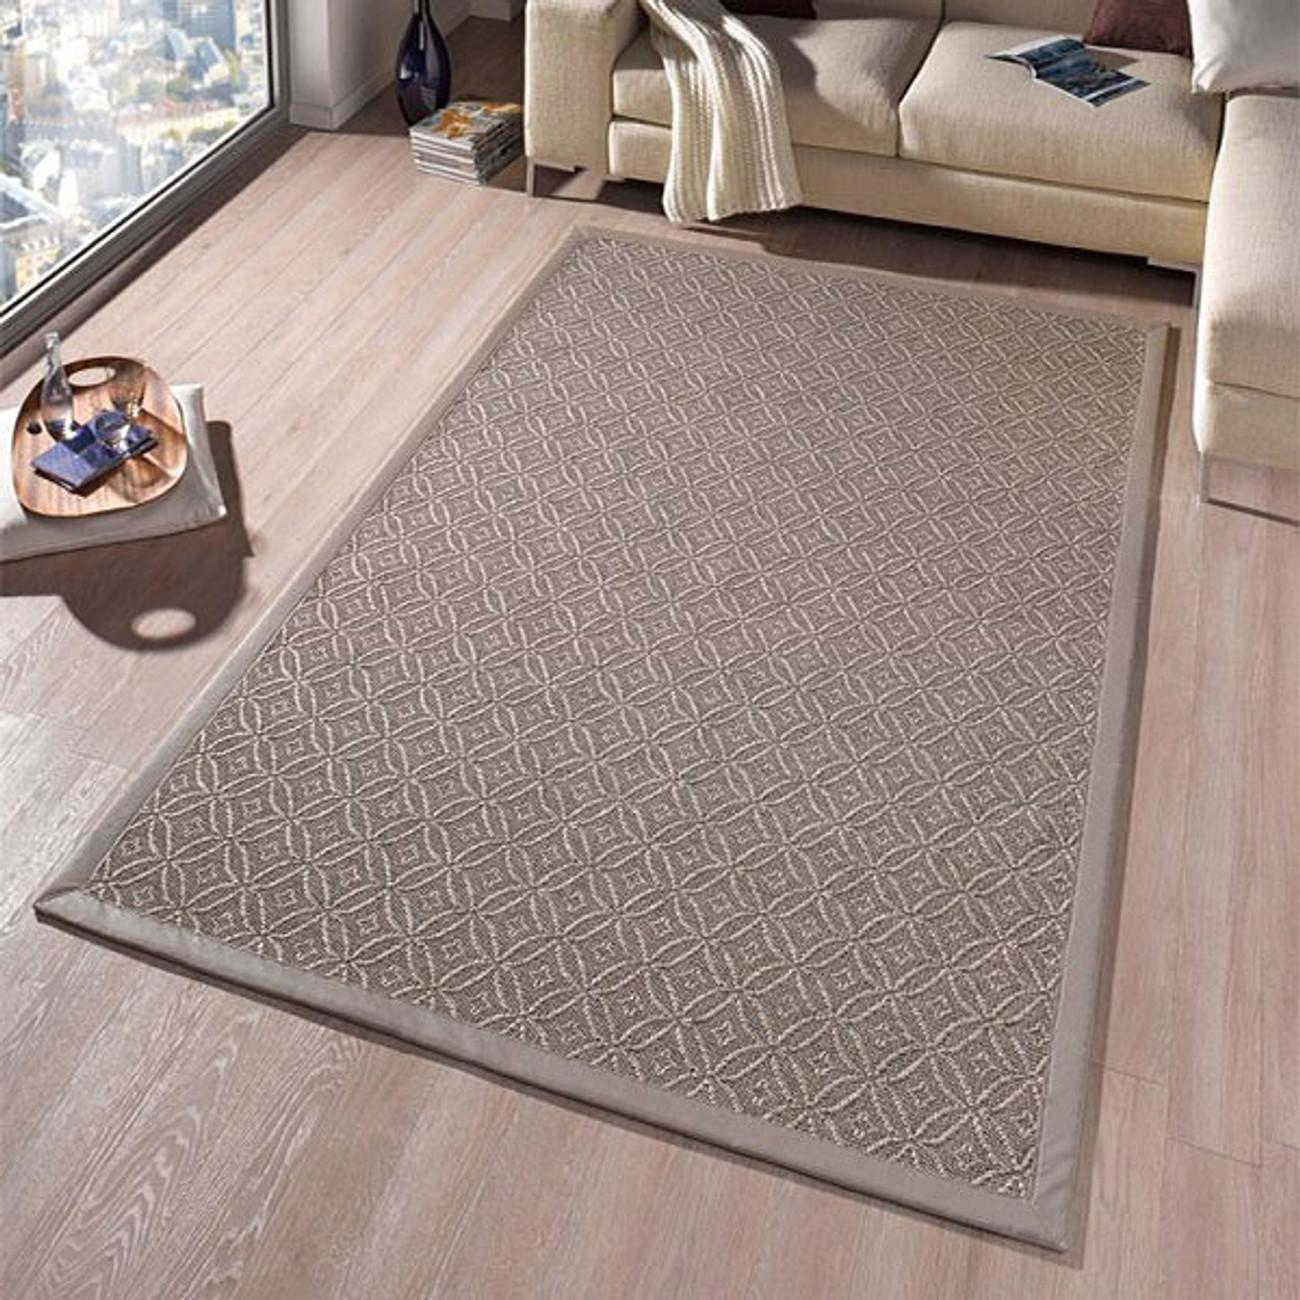 Excellent Design Flachgewebe Teppich Infinite Ornament Grau Taupe With  Teppich Gewebt With Teppich Flach Gewebt Grau.